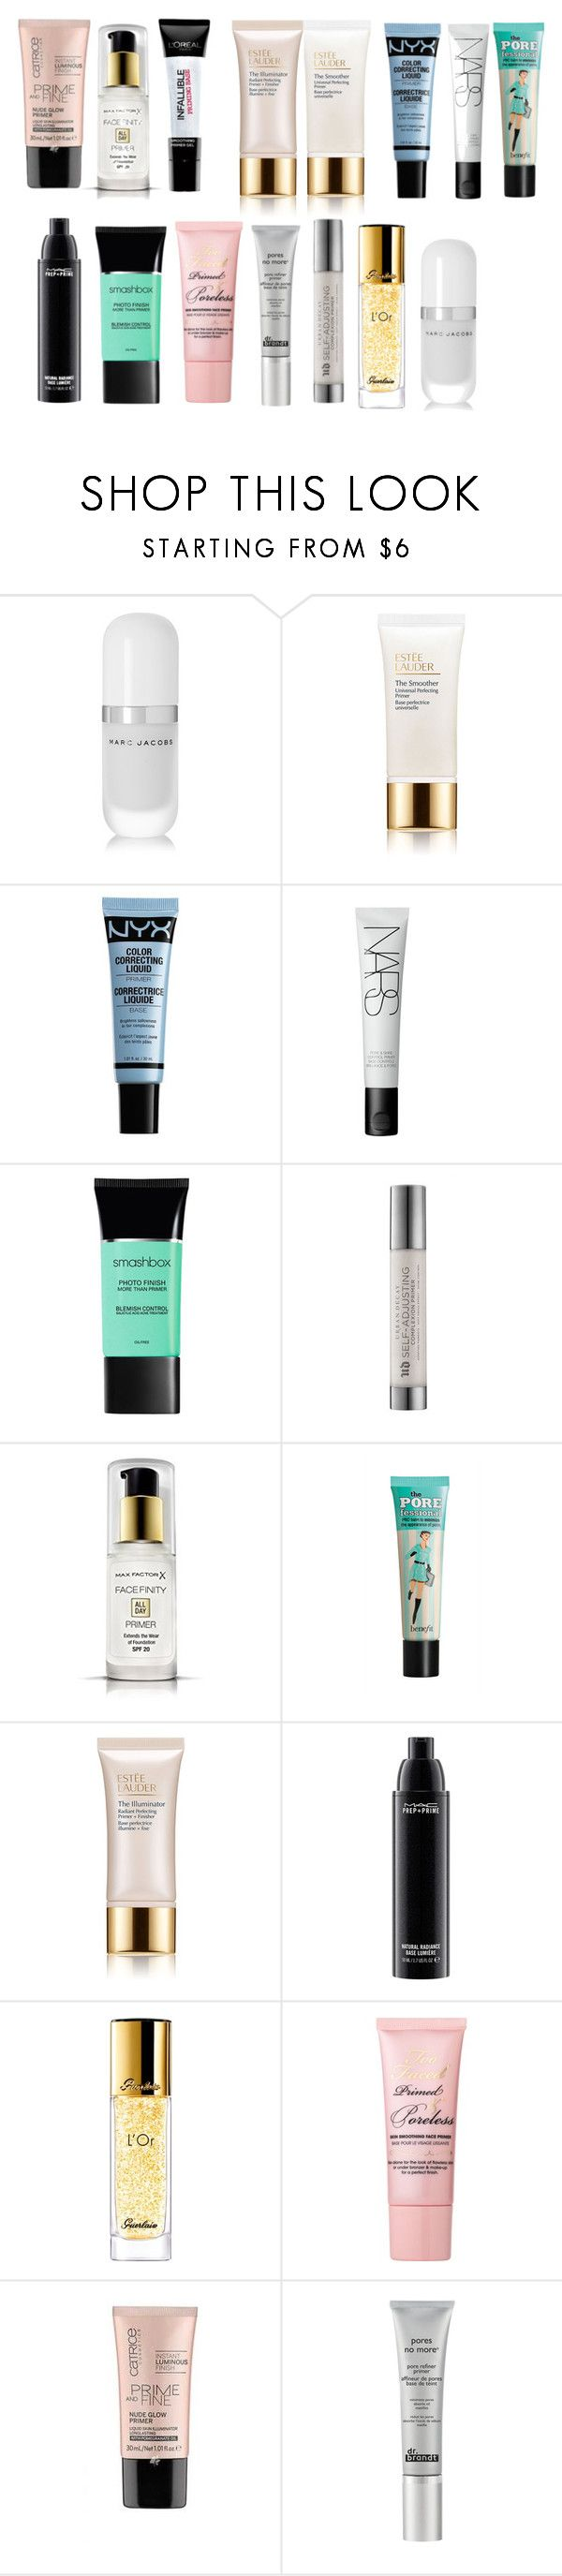 """primers"" by azra-99 on Polyvore featuring beauty, Marc Jacobs, Estée Lauder, NARS Cosmetics, Smashbox, Urban Decay, Max Factor, Benefit, L'Oréal Paris and MAC Cosmetics"